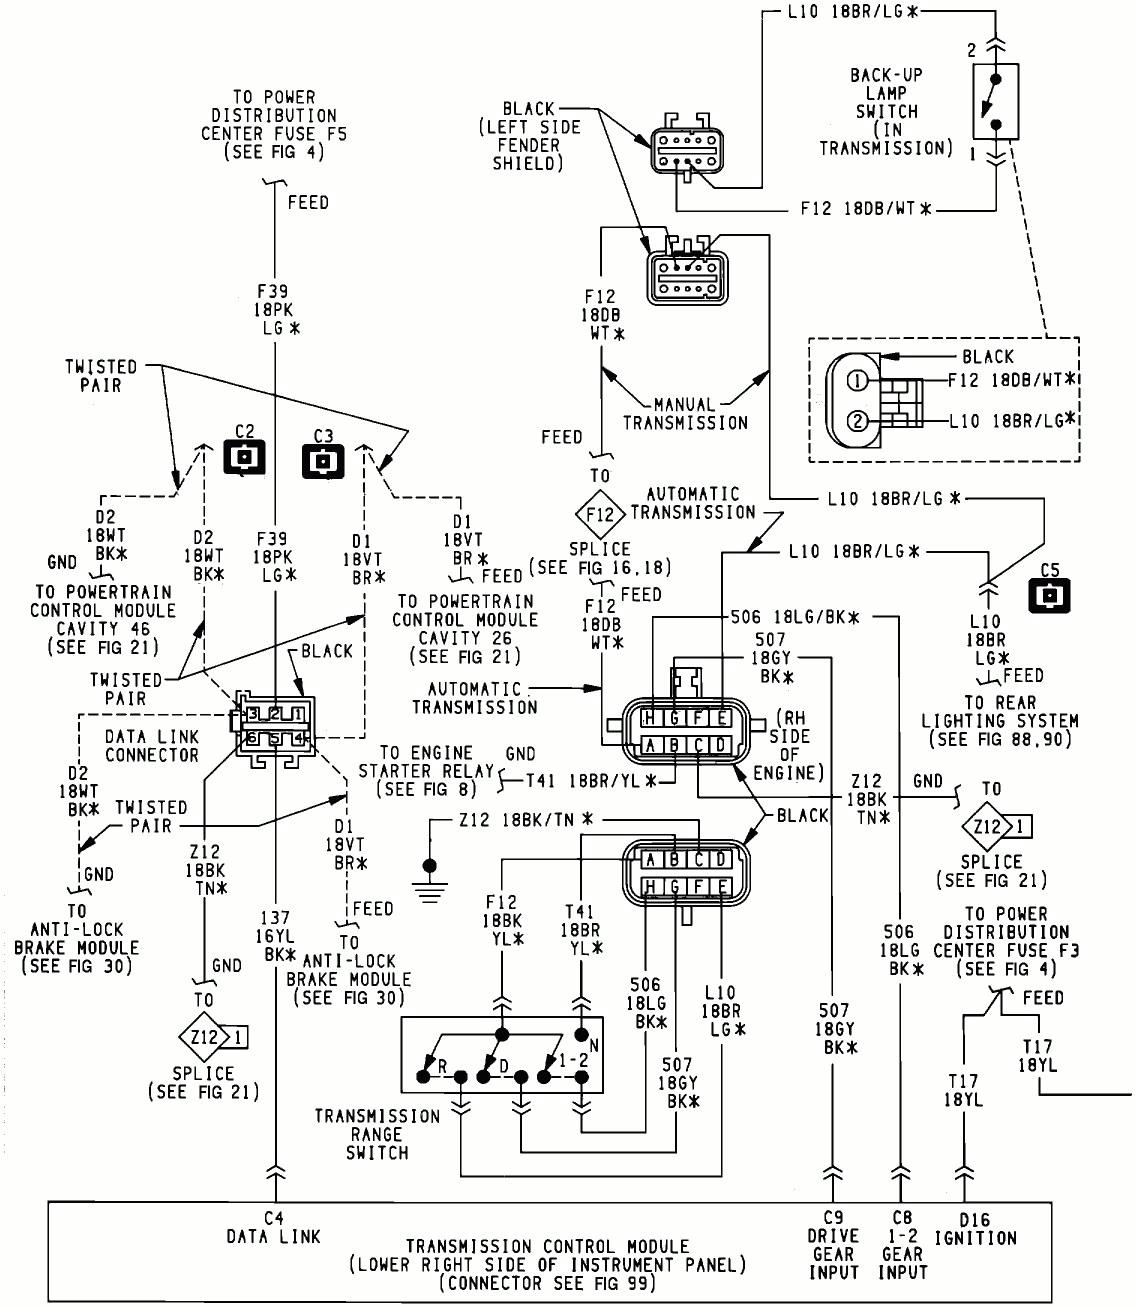 jeep trailer plug wiring diagram wiring diagram operations 95 jeep trailer wiring book diagram schema jeep